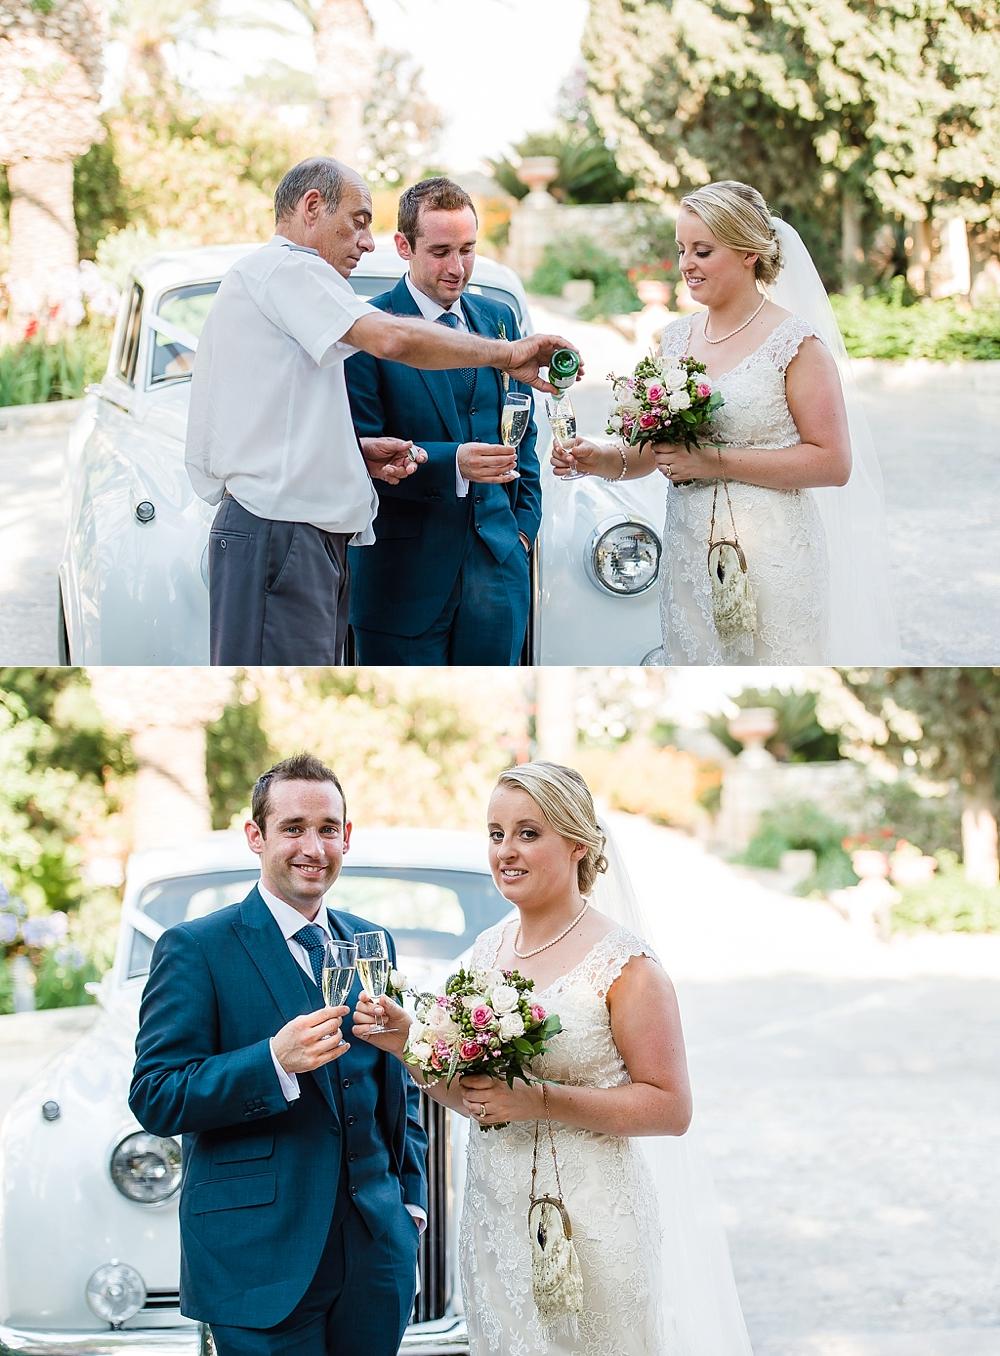 Razzett L-Abjad Wedding - Shane P. Watts Photography - Malta